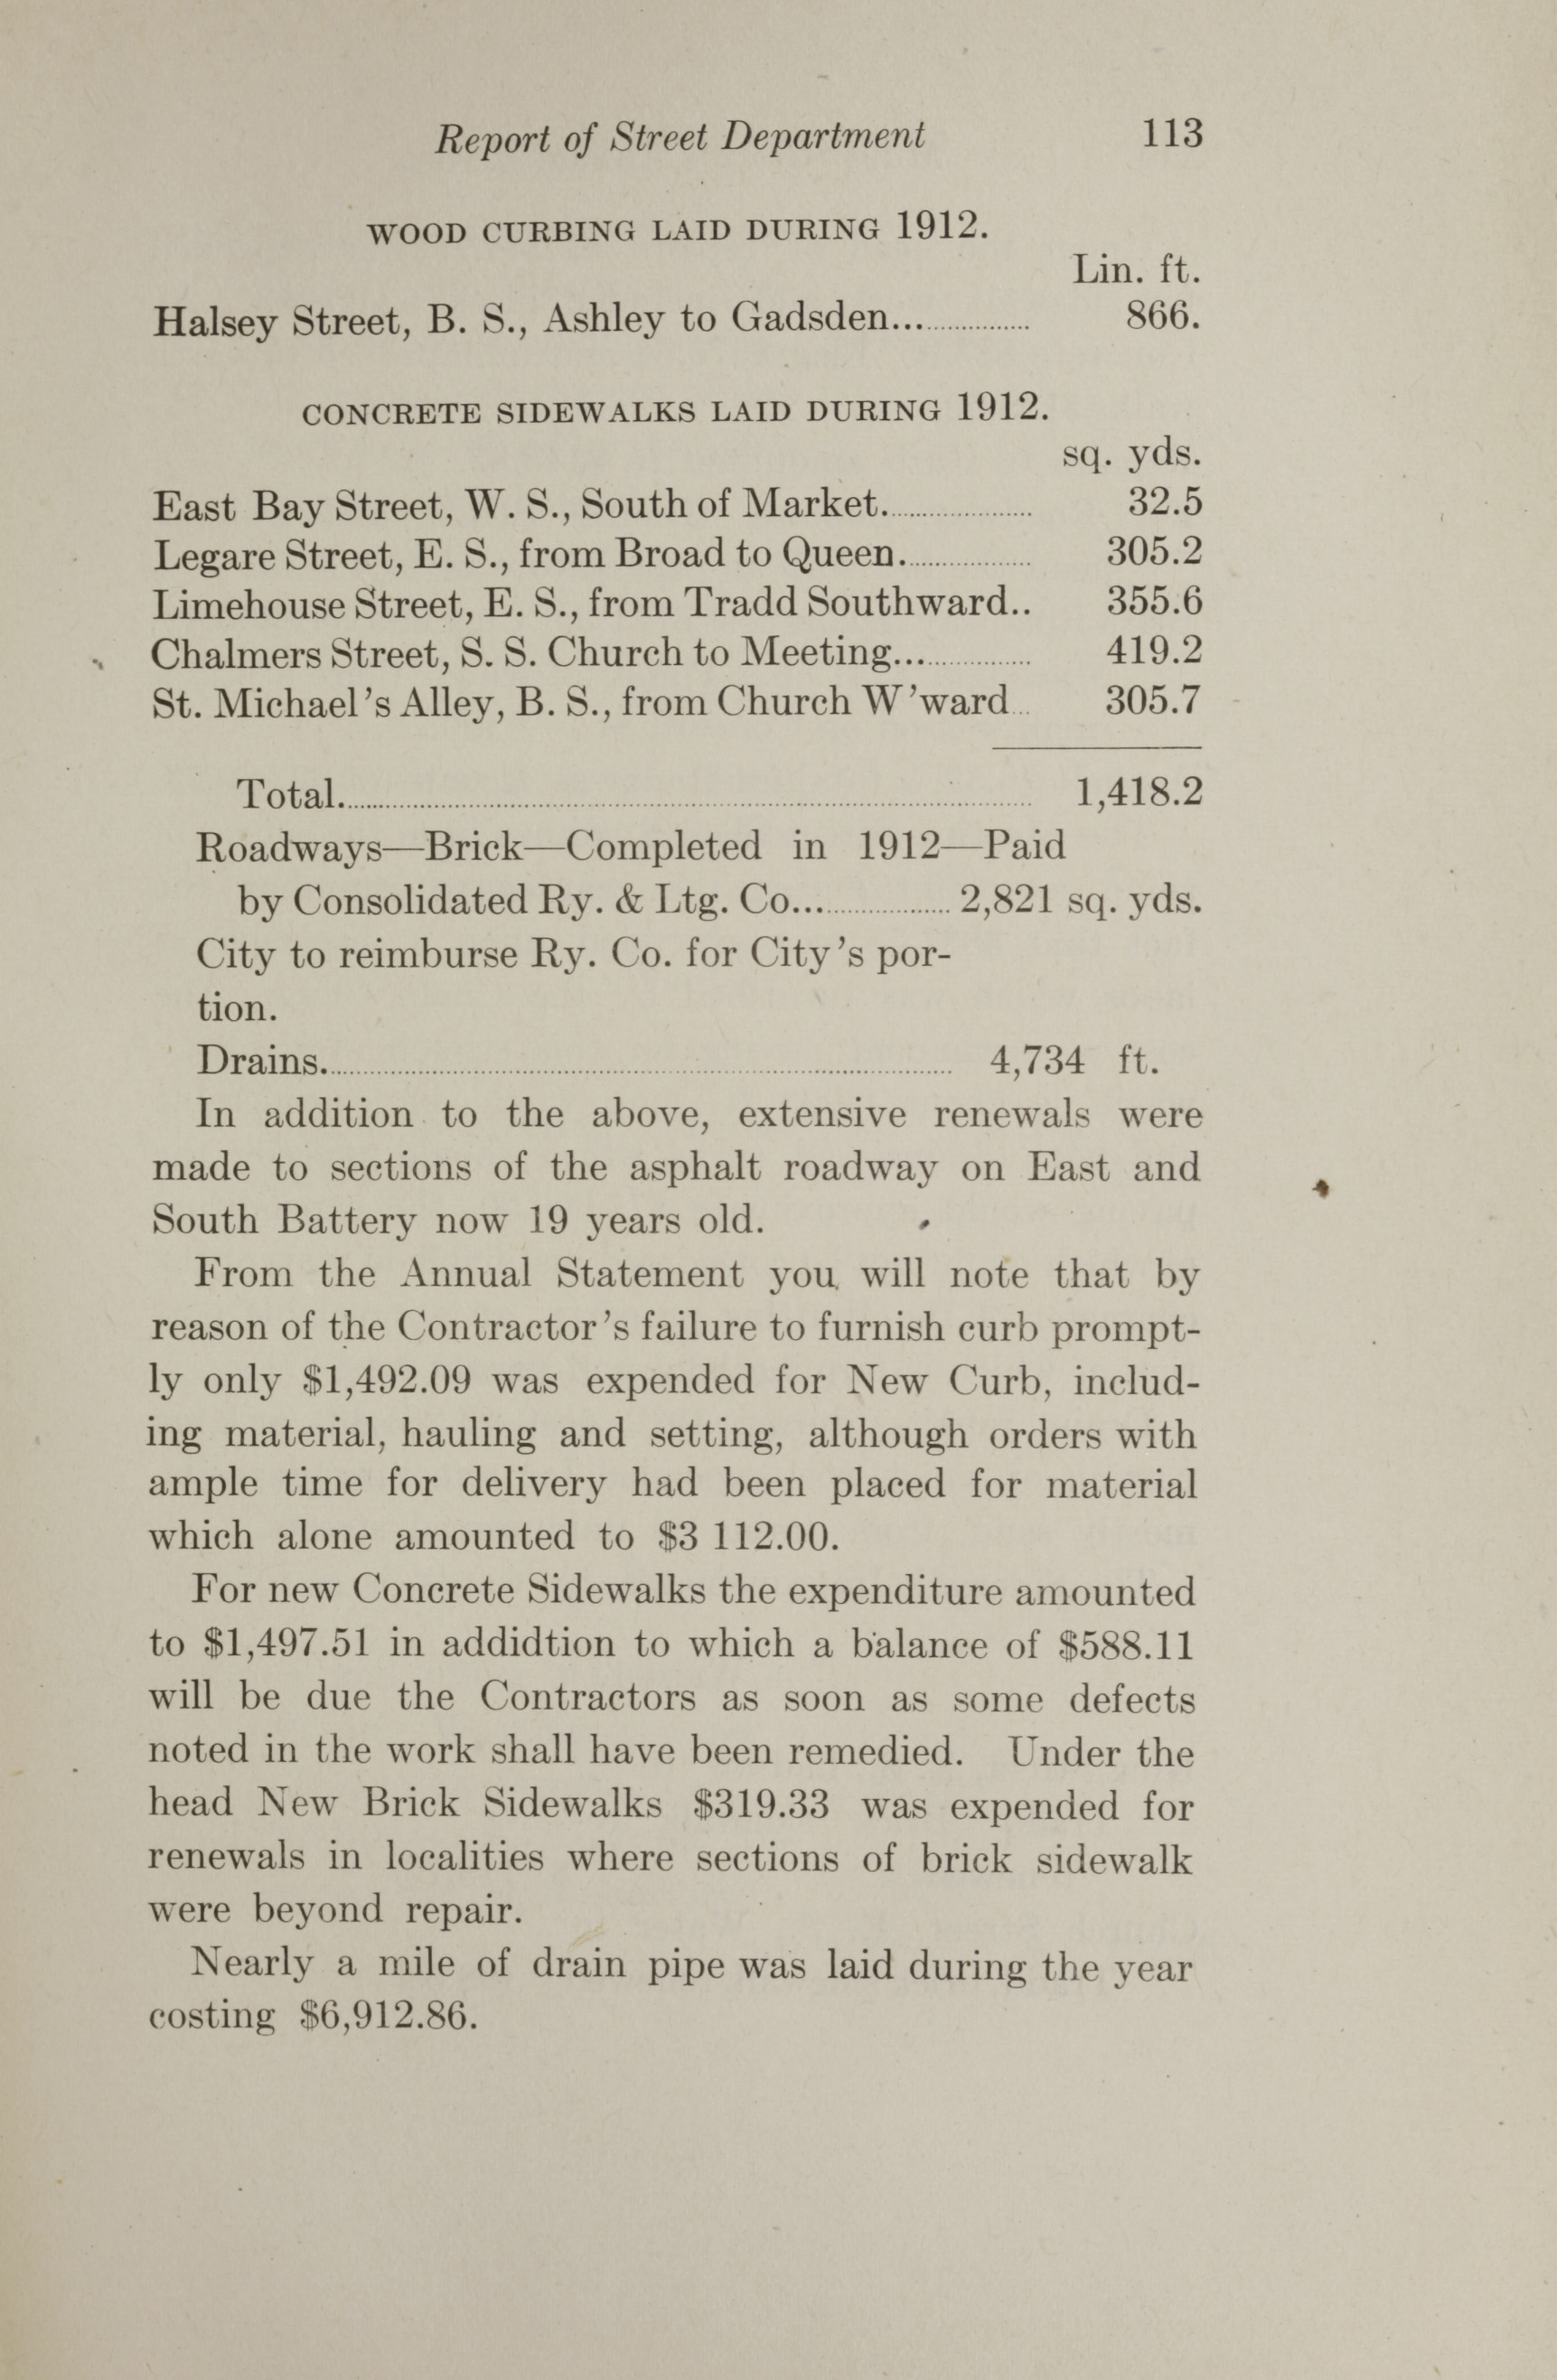 Charleston Yearbook, 1912, page 113